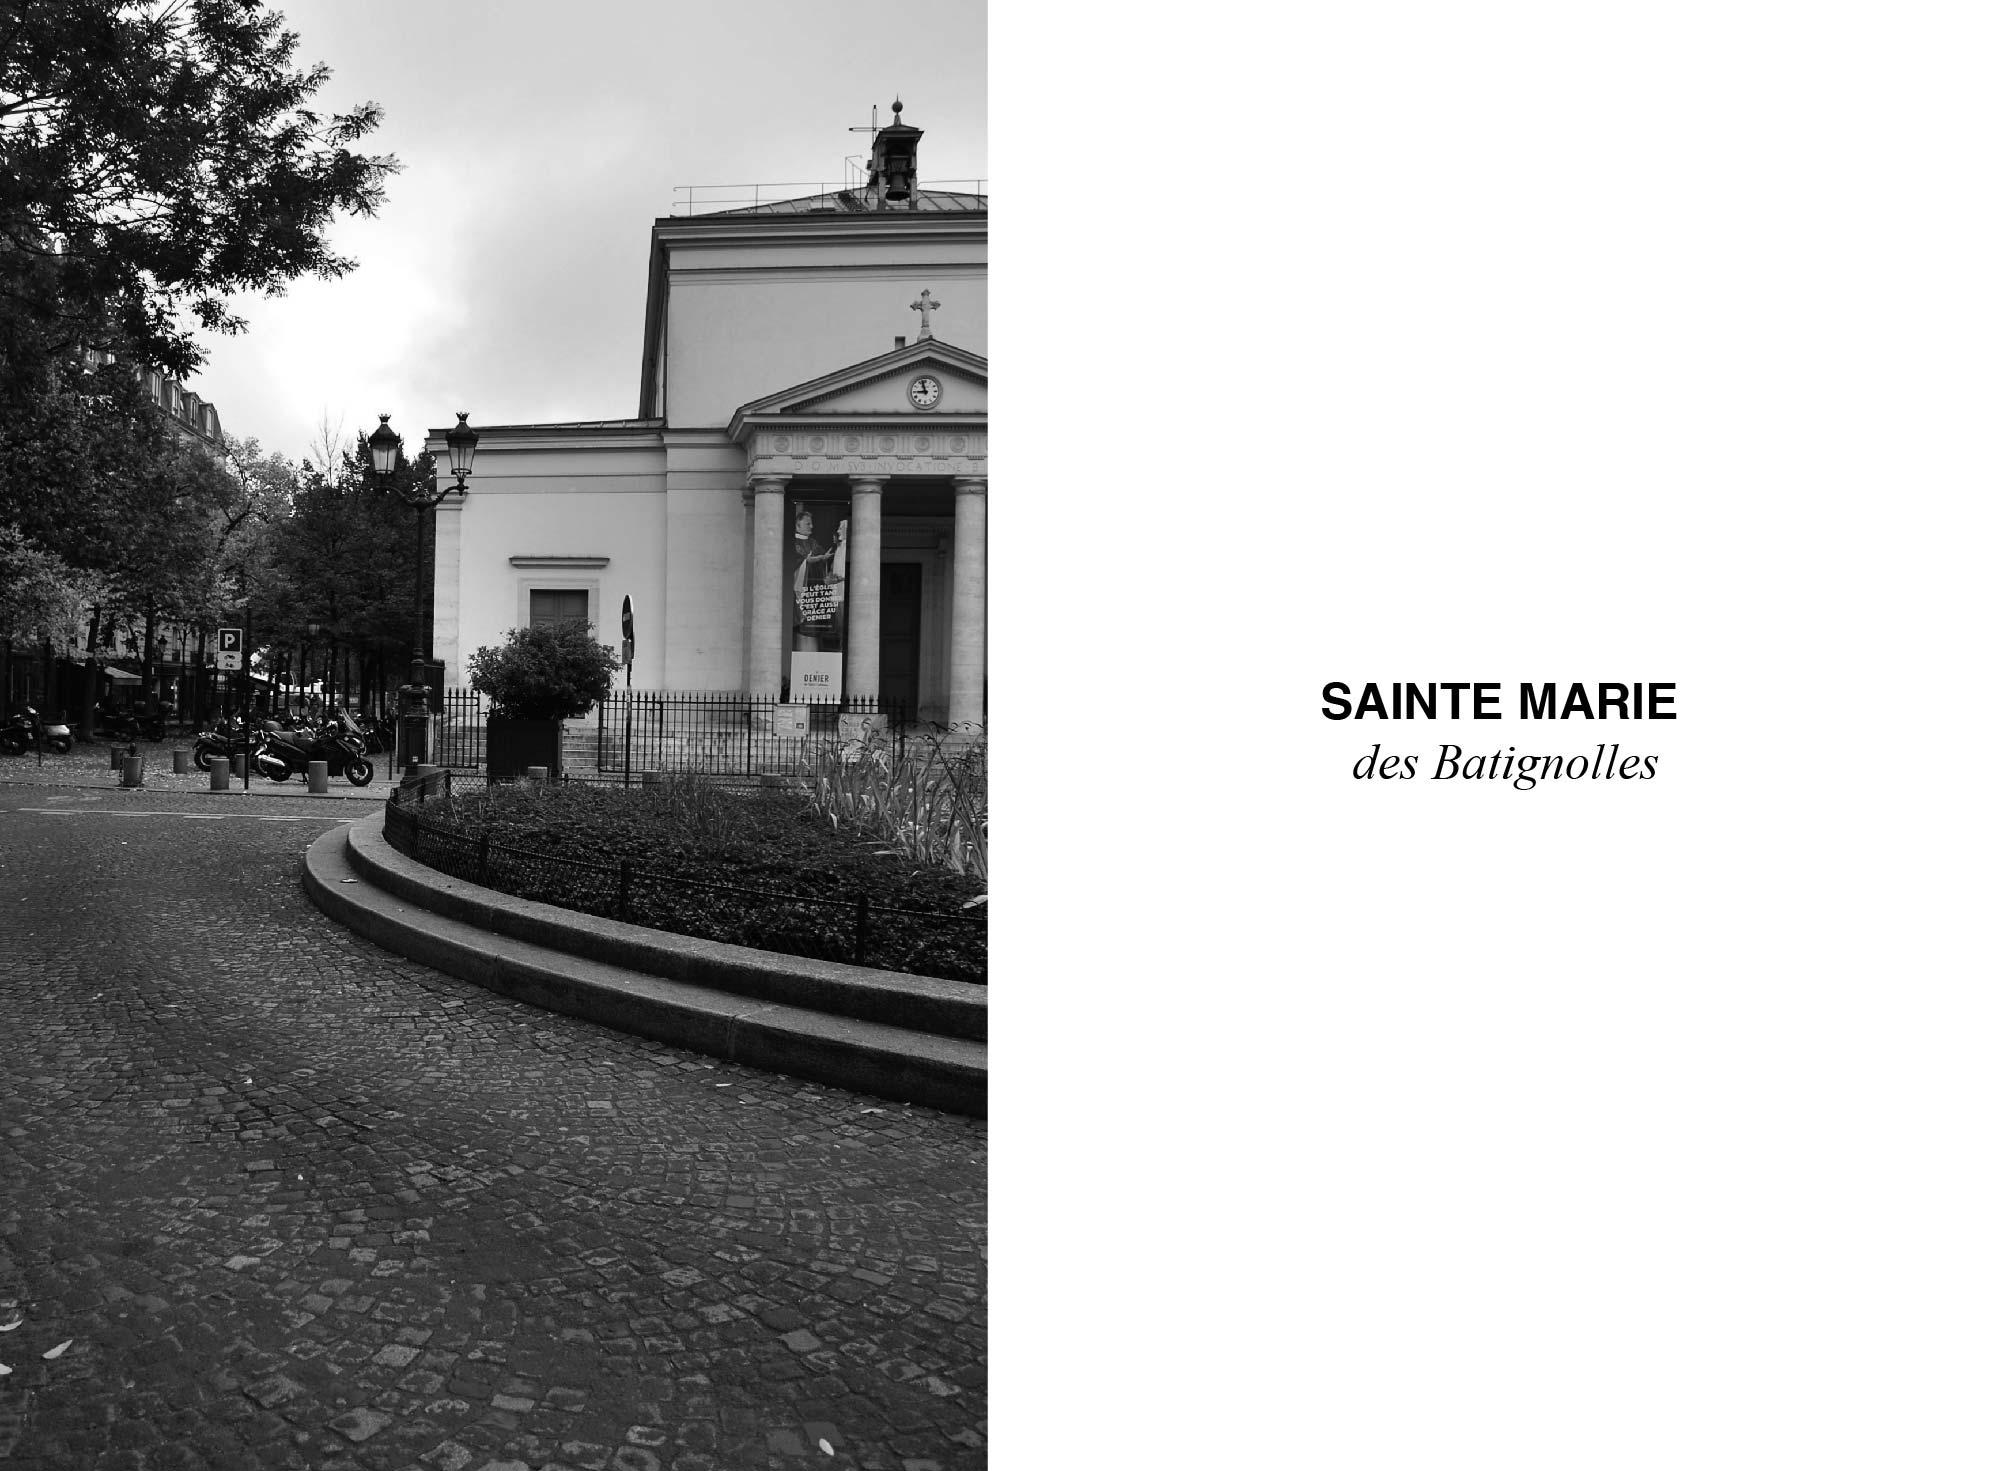 sainte-marie-batignolles-01